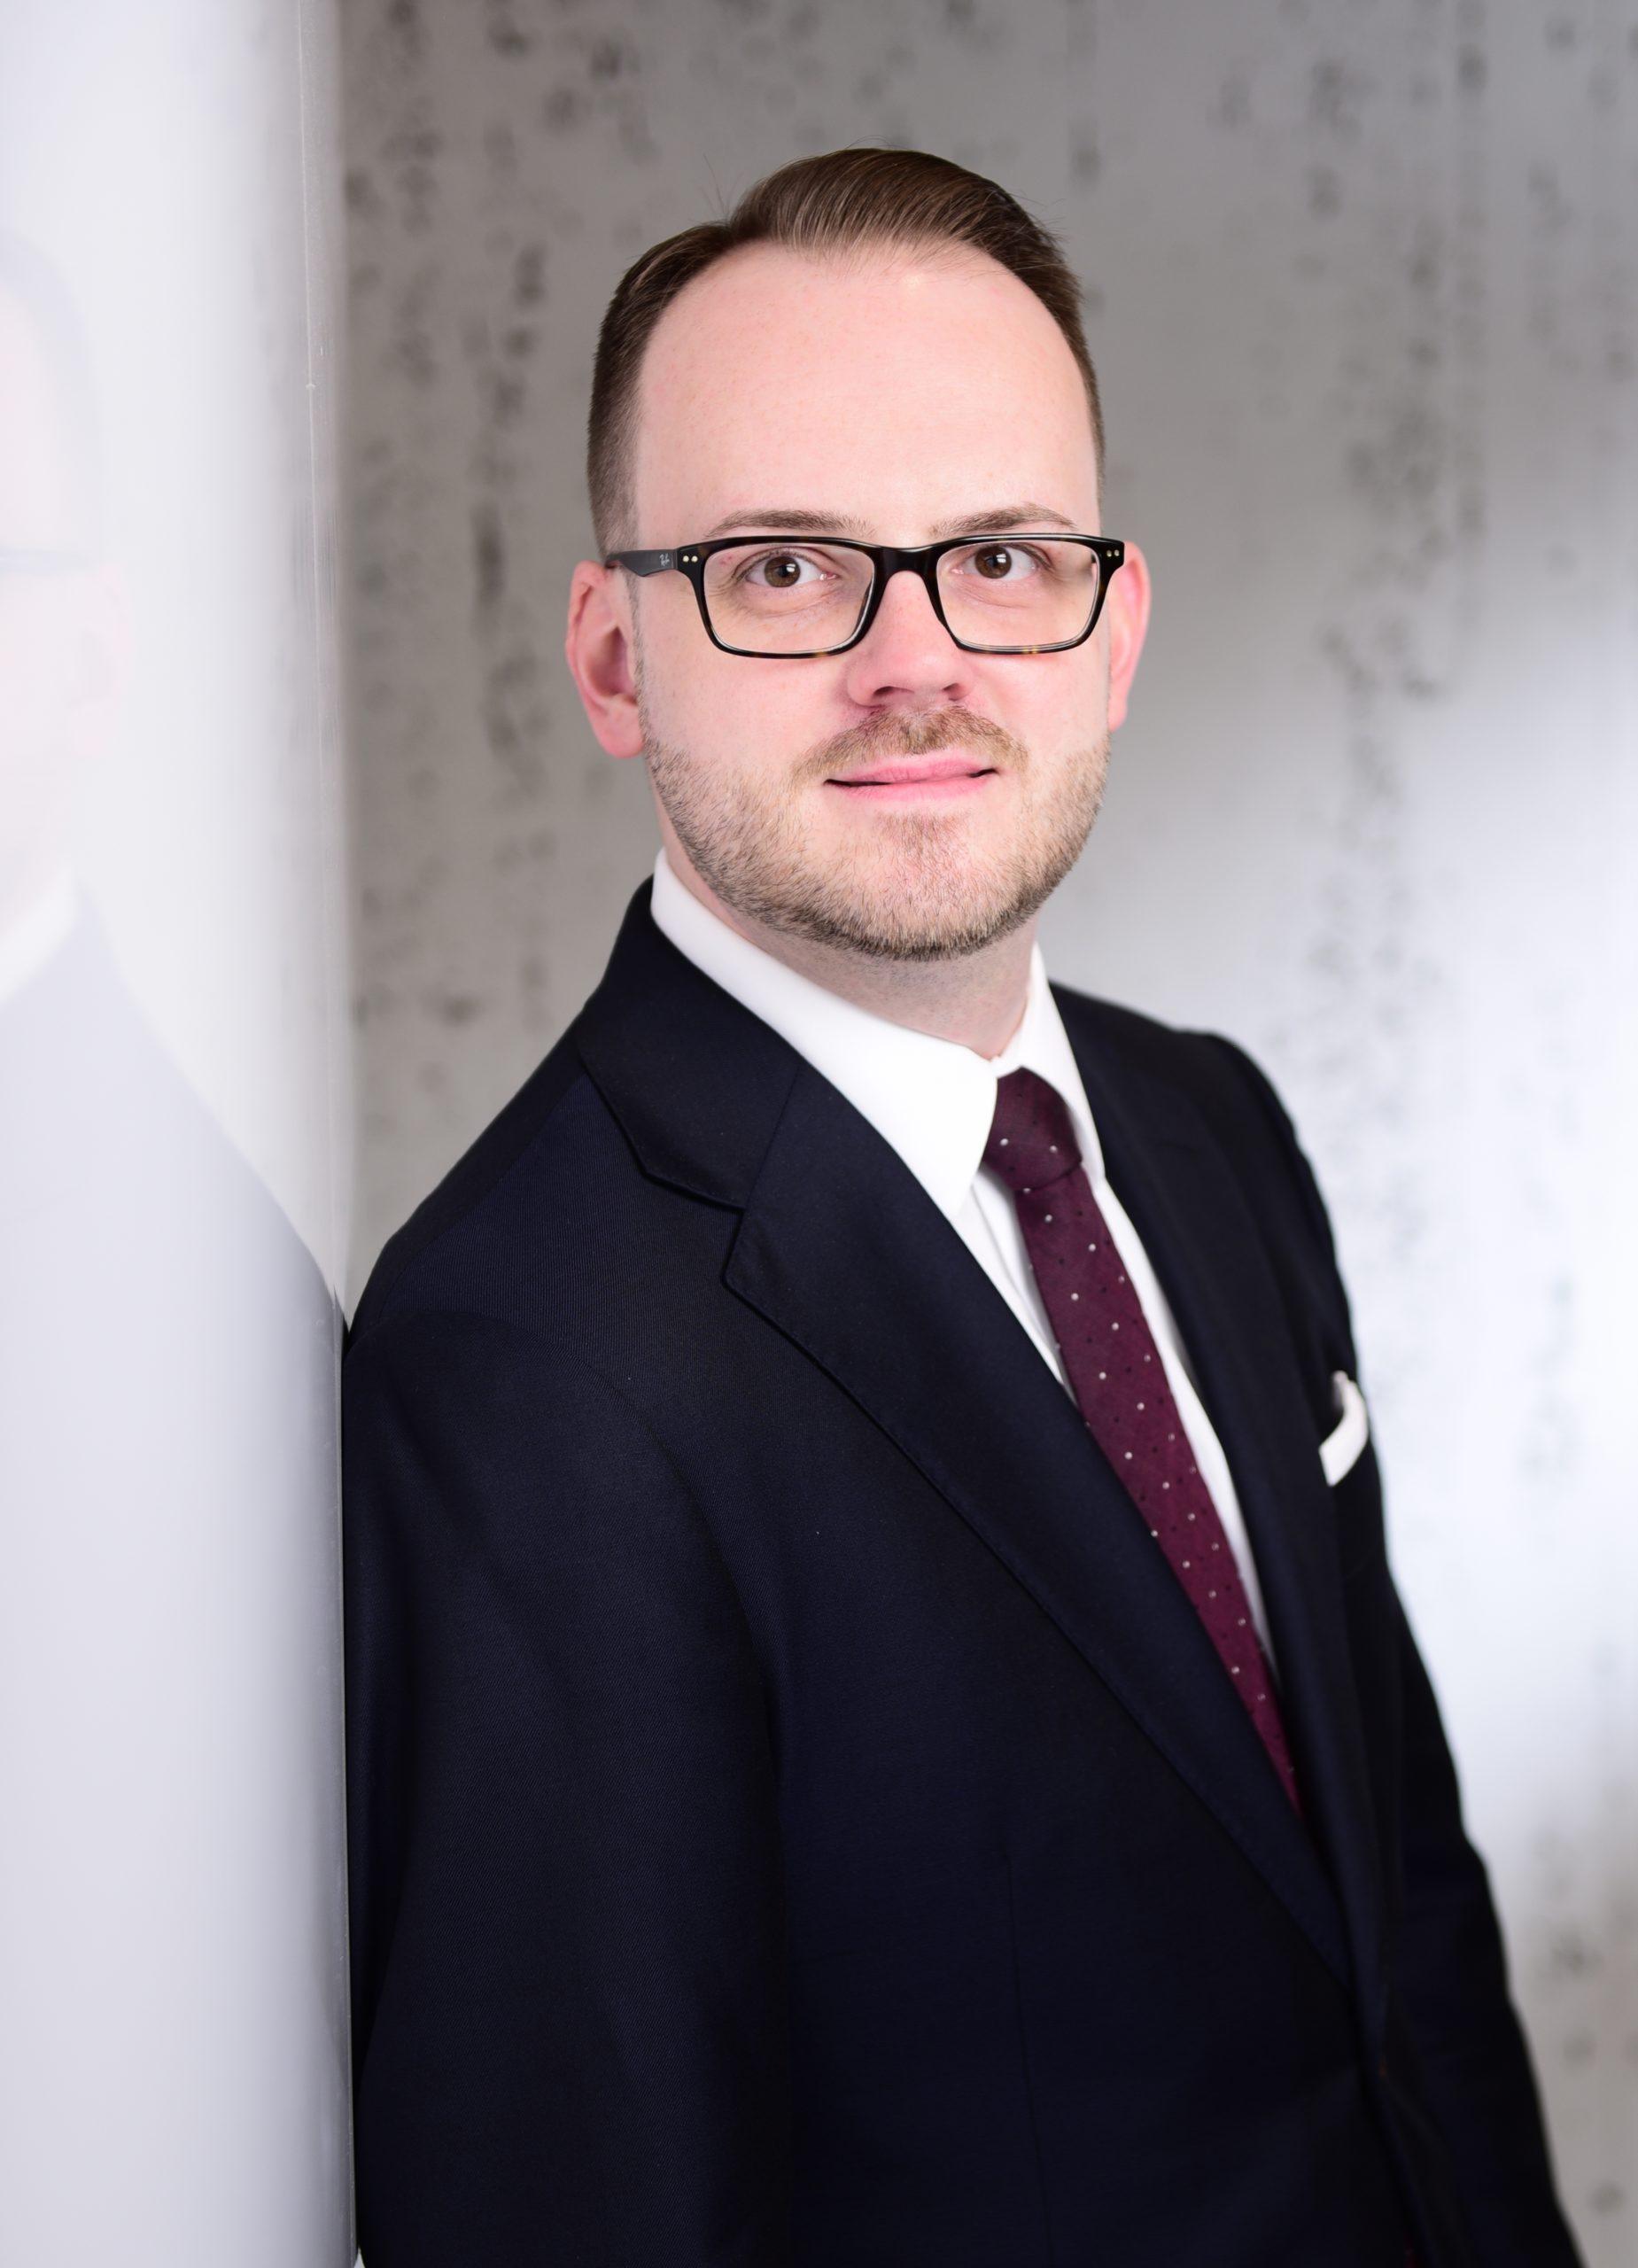 Rechtsanwalt für Steuerrecht Herbert Botterbrod